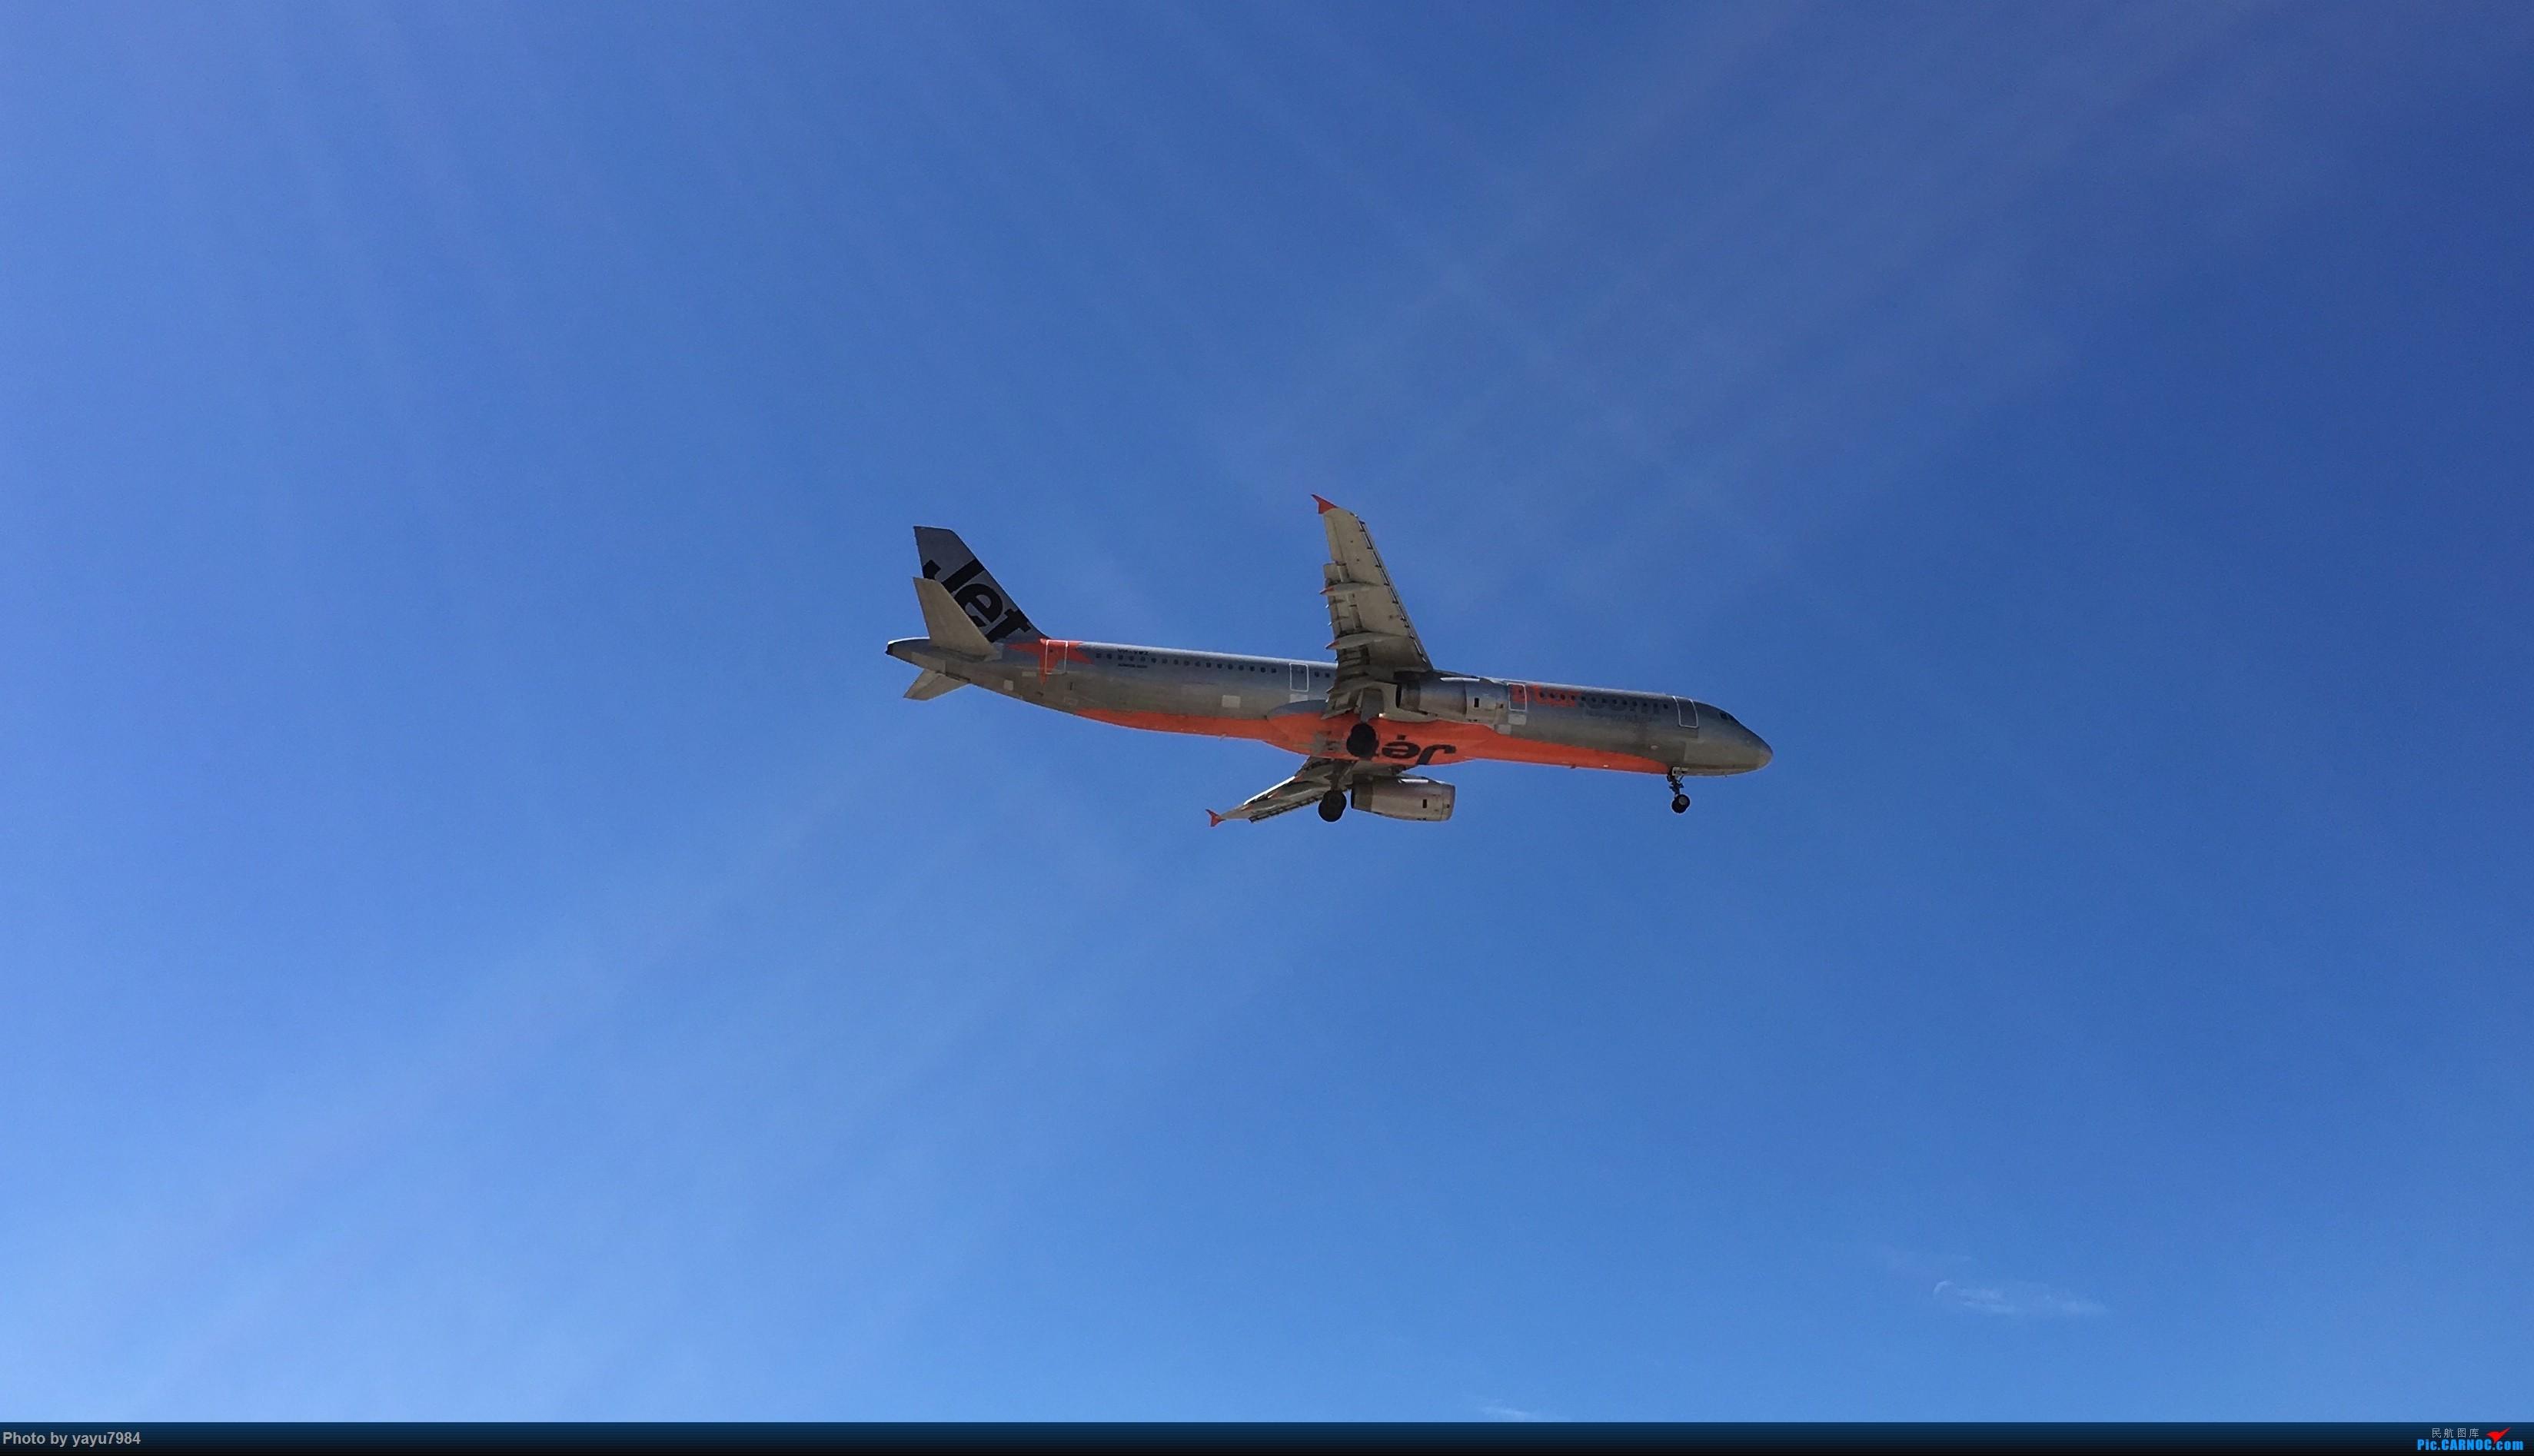 Re:[原创][SYD] 久违的南向起降,纪录16R拍机之行 AIRBUS A321-200 VH-VWZ 澳大利亚悉尼金斯福德·史密斯机场